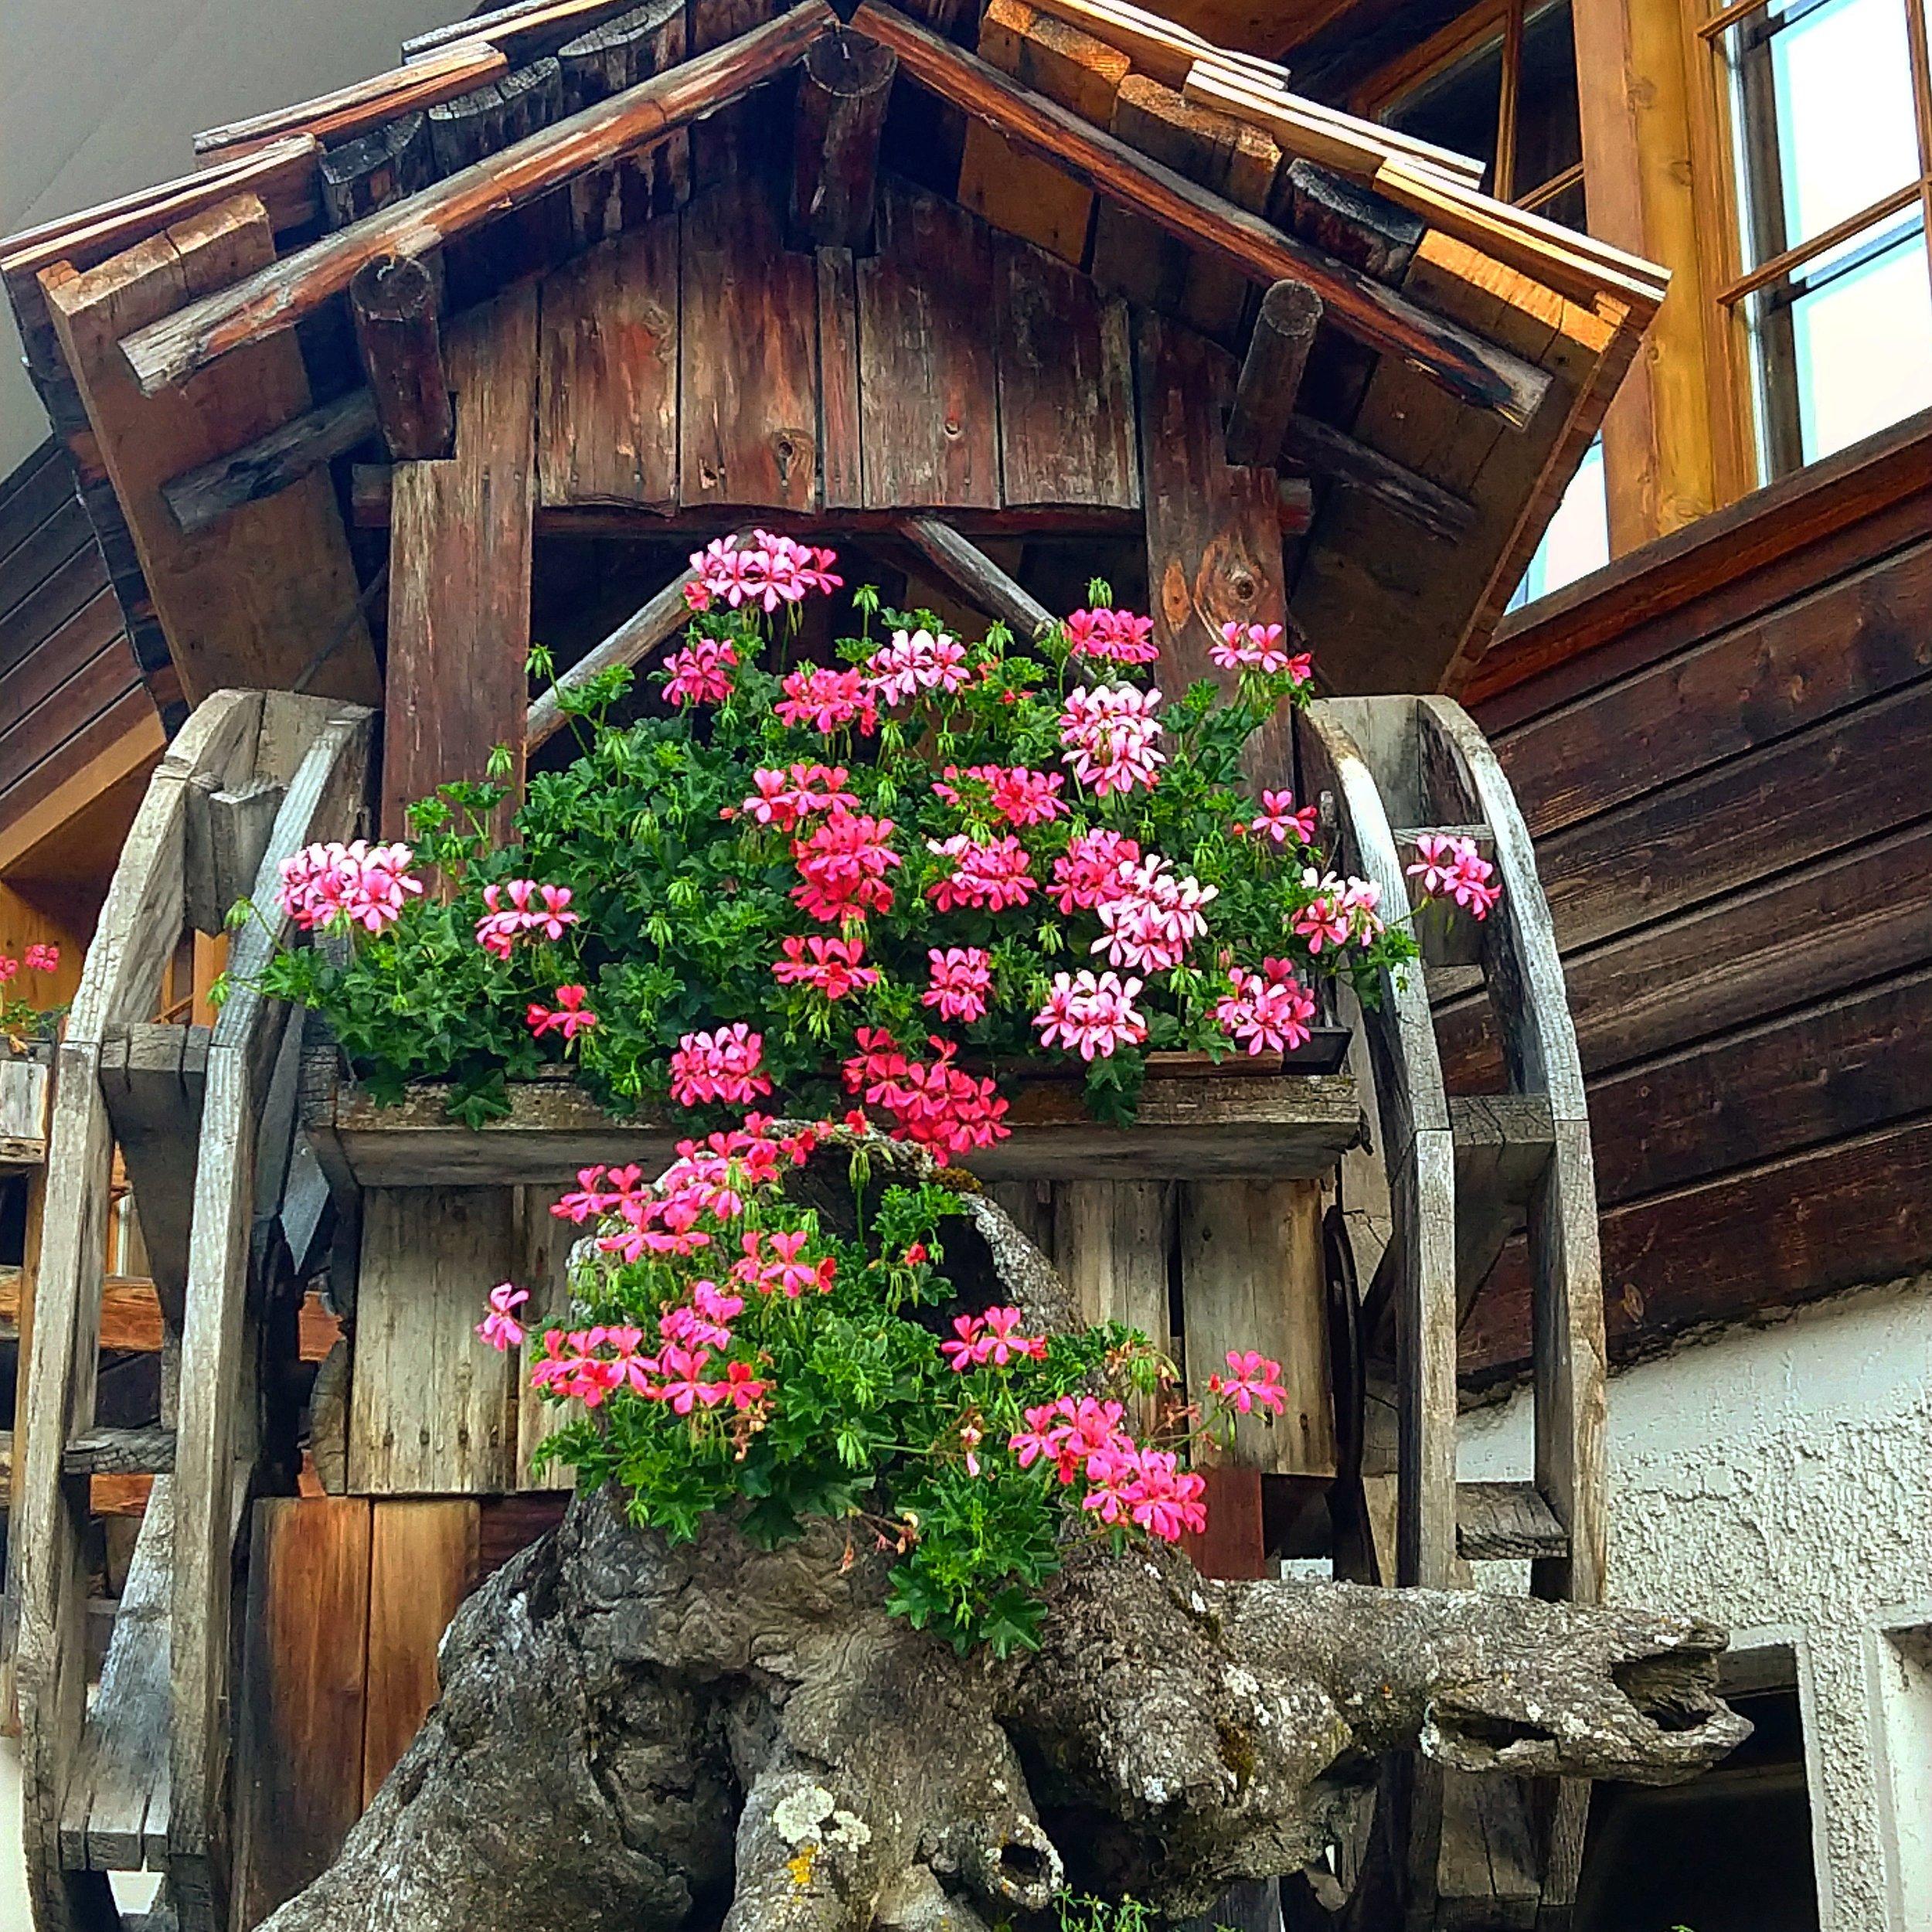 grimentzflowerwheels.jpg